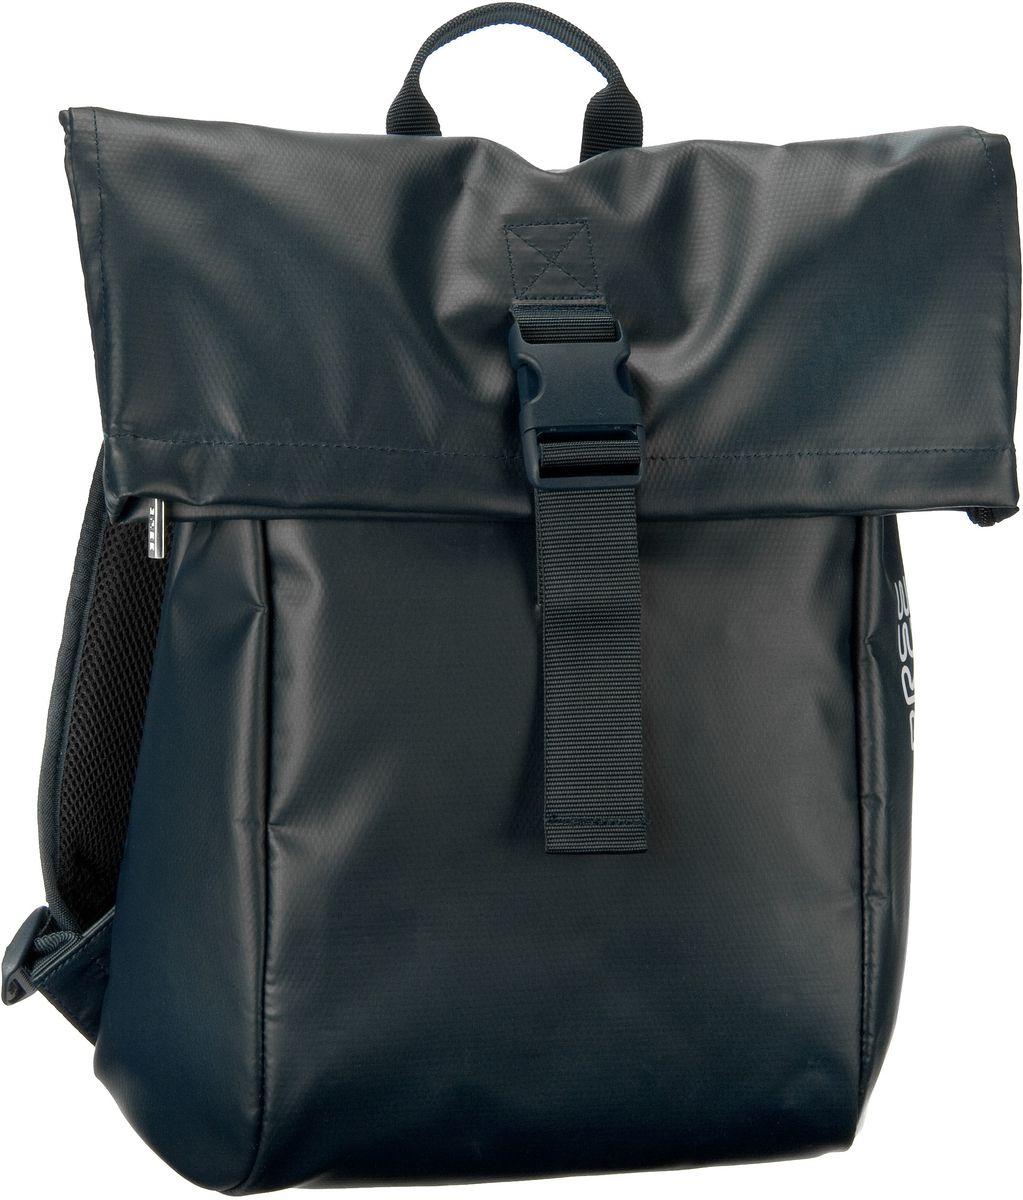 Rucksack / Daypack Punch 92 Blue (innen: Grau) (13 Liter)